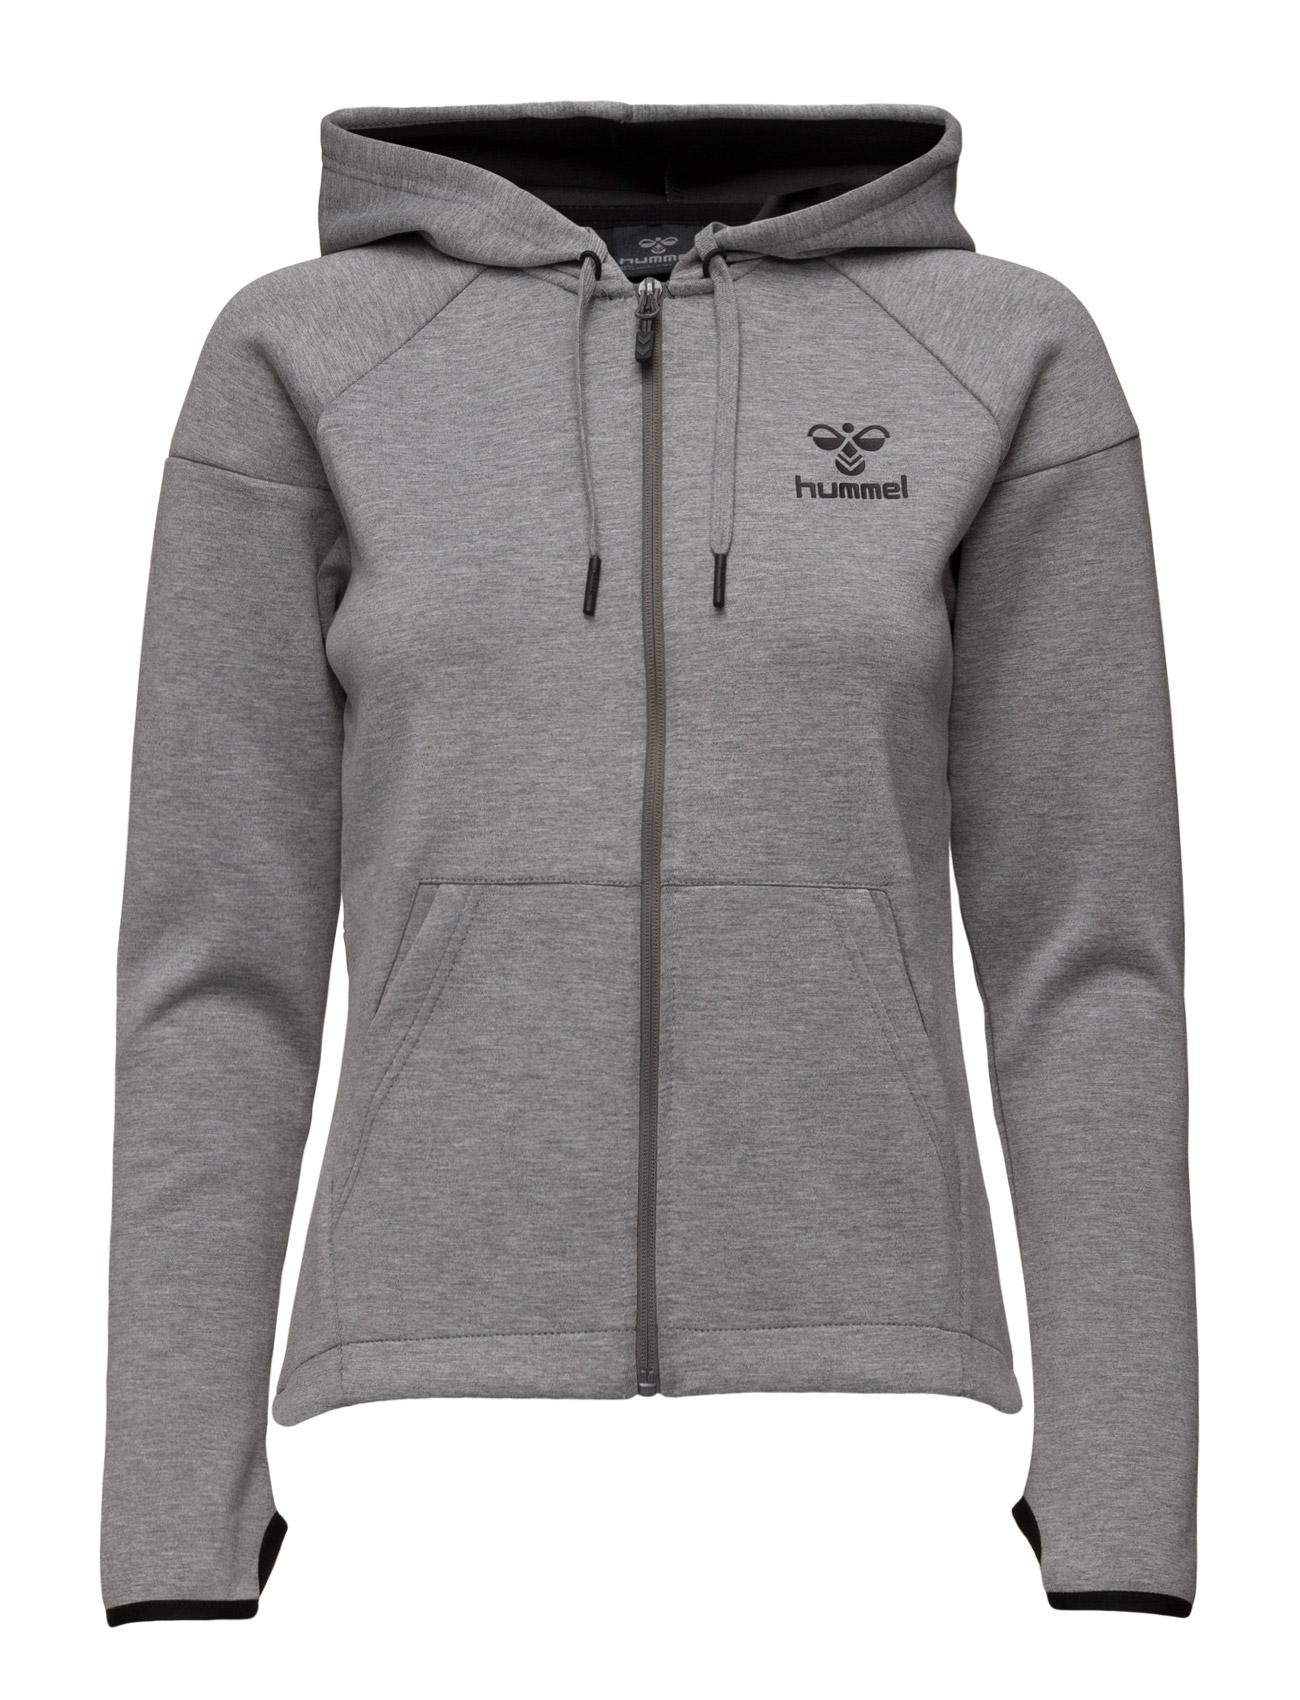 Classic Bee Wo Neo Zip Jacket Hummel Sports toppe til Unisex i Grey Melange